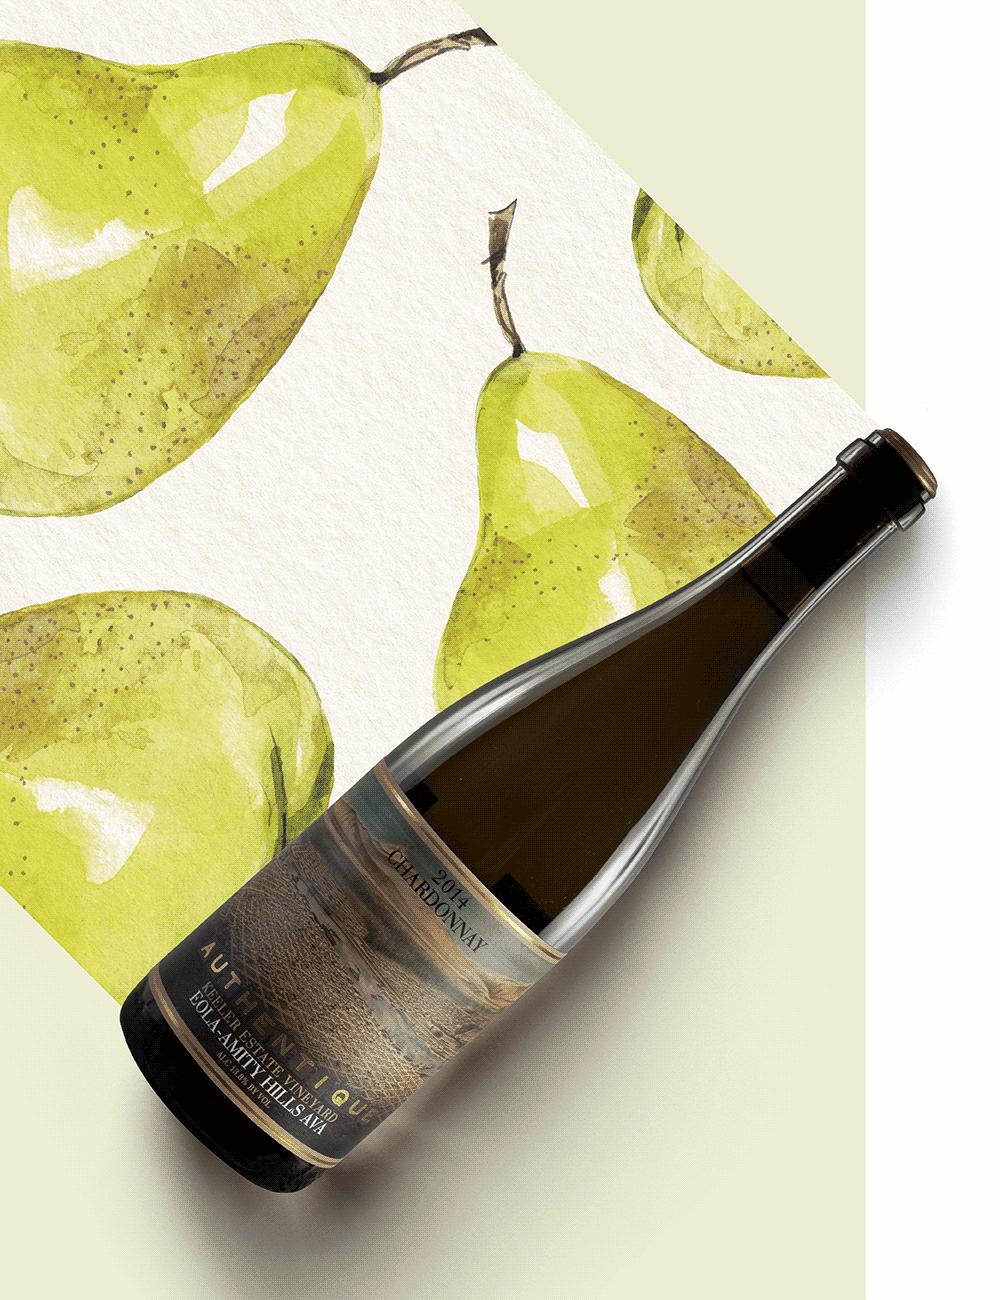 Authentique Keeler Estate Chardonnay 2014